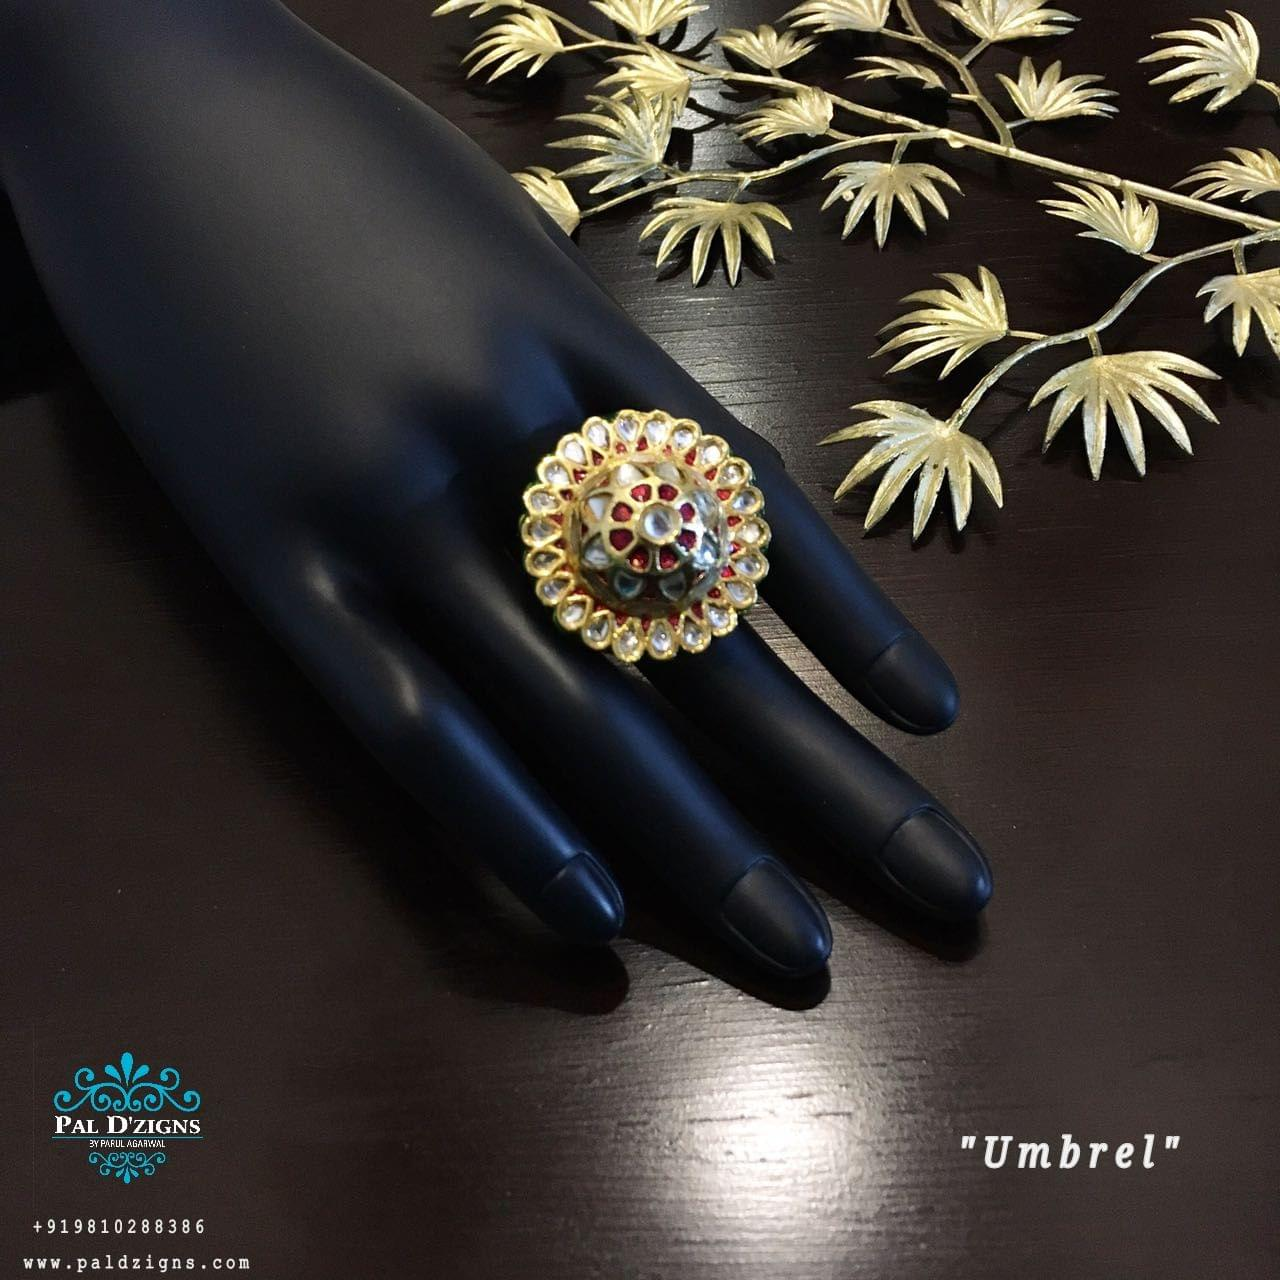 Umbrel Kundan Ring